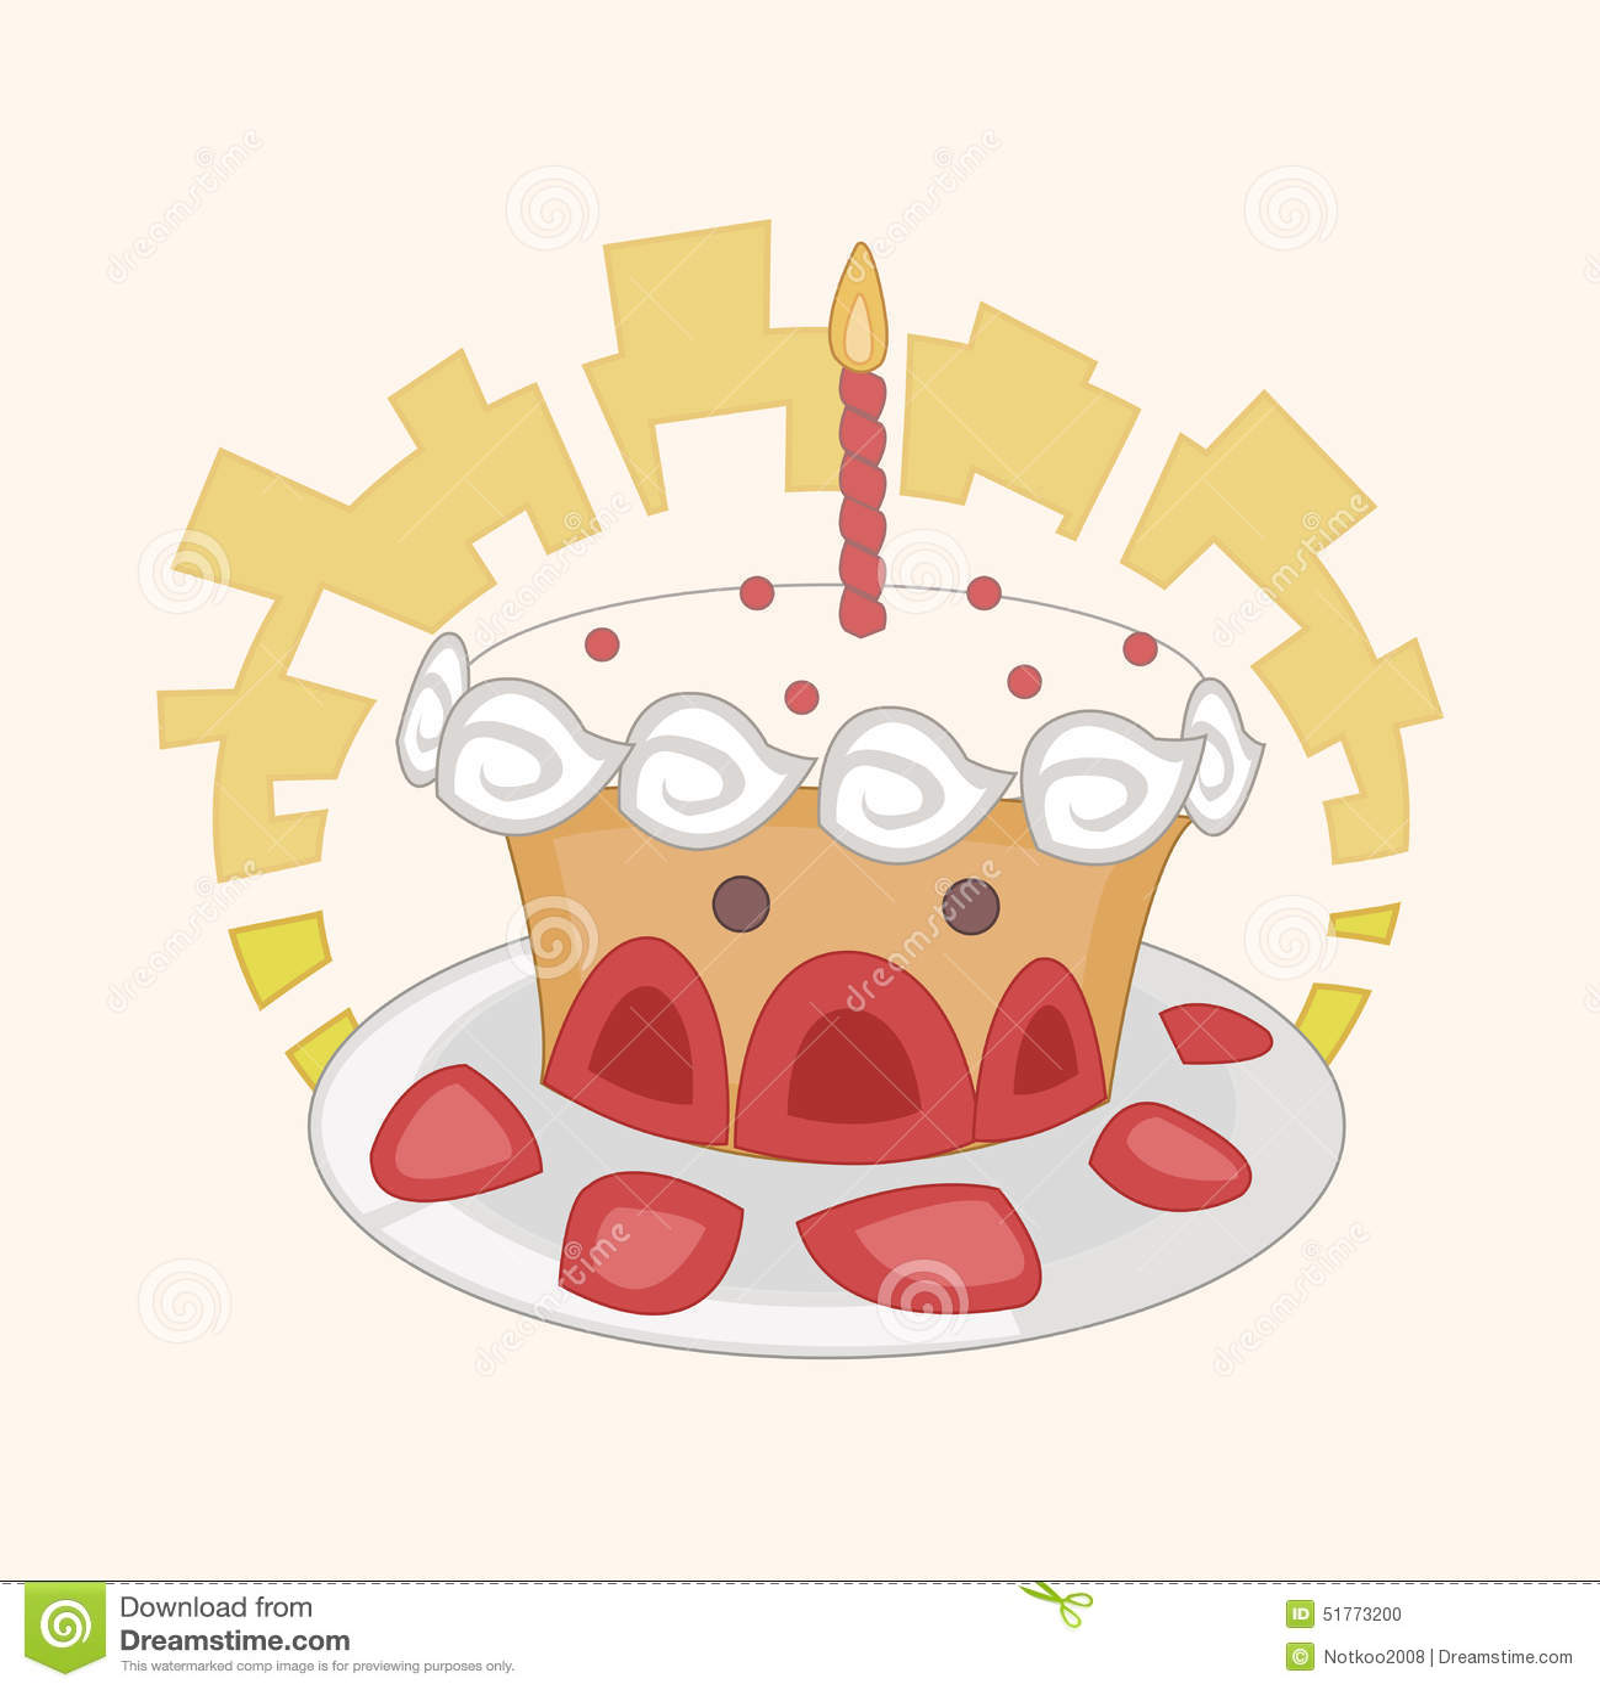 Bake Dreams Cake Design